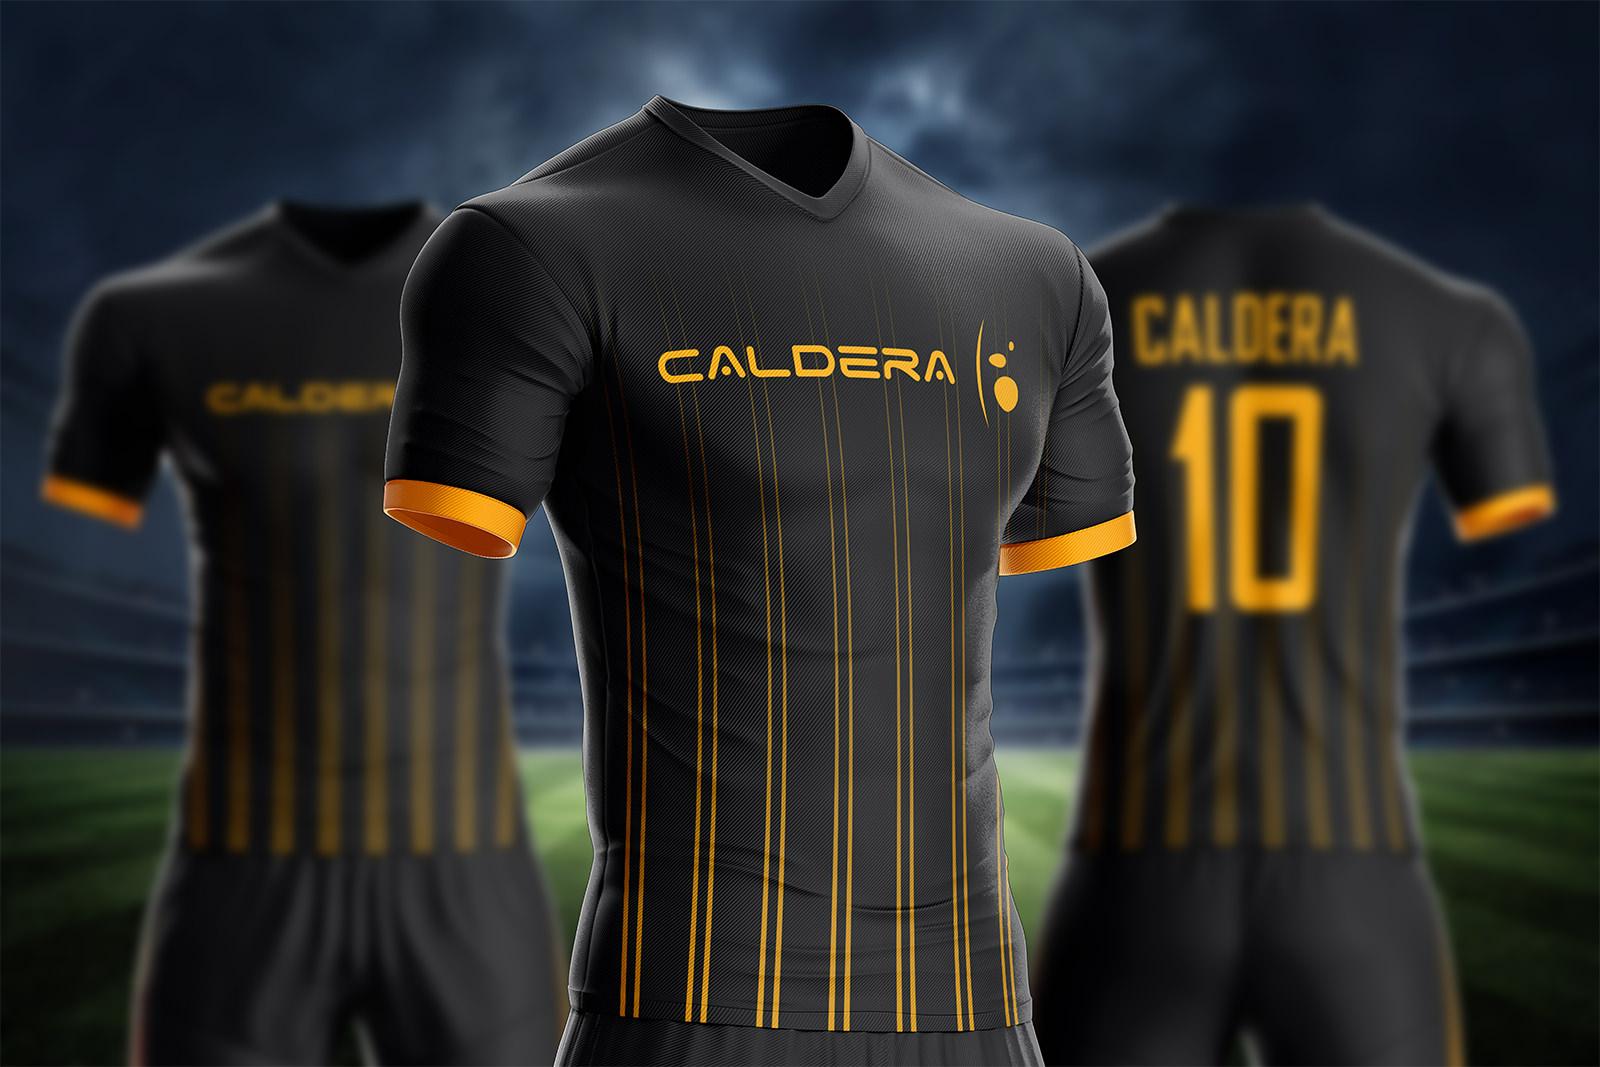 Sportswear printed with CalderaRIP software